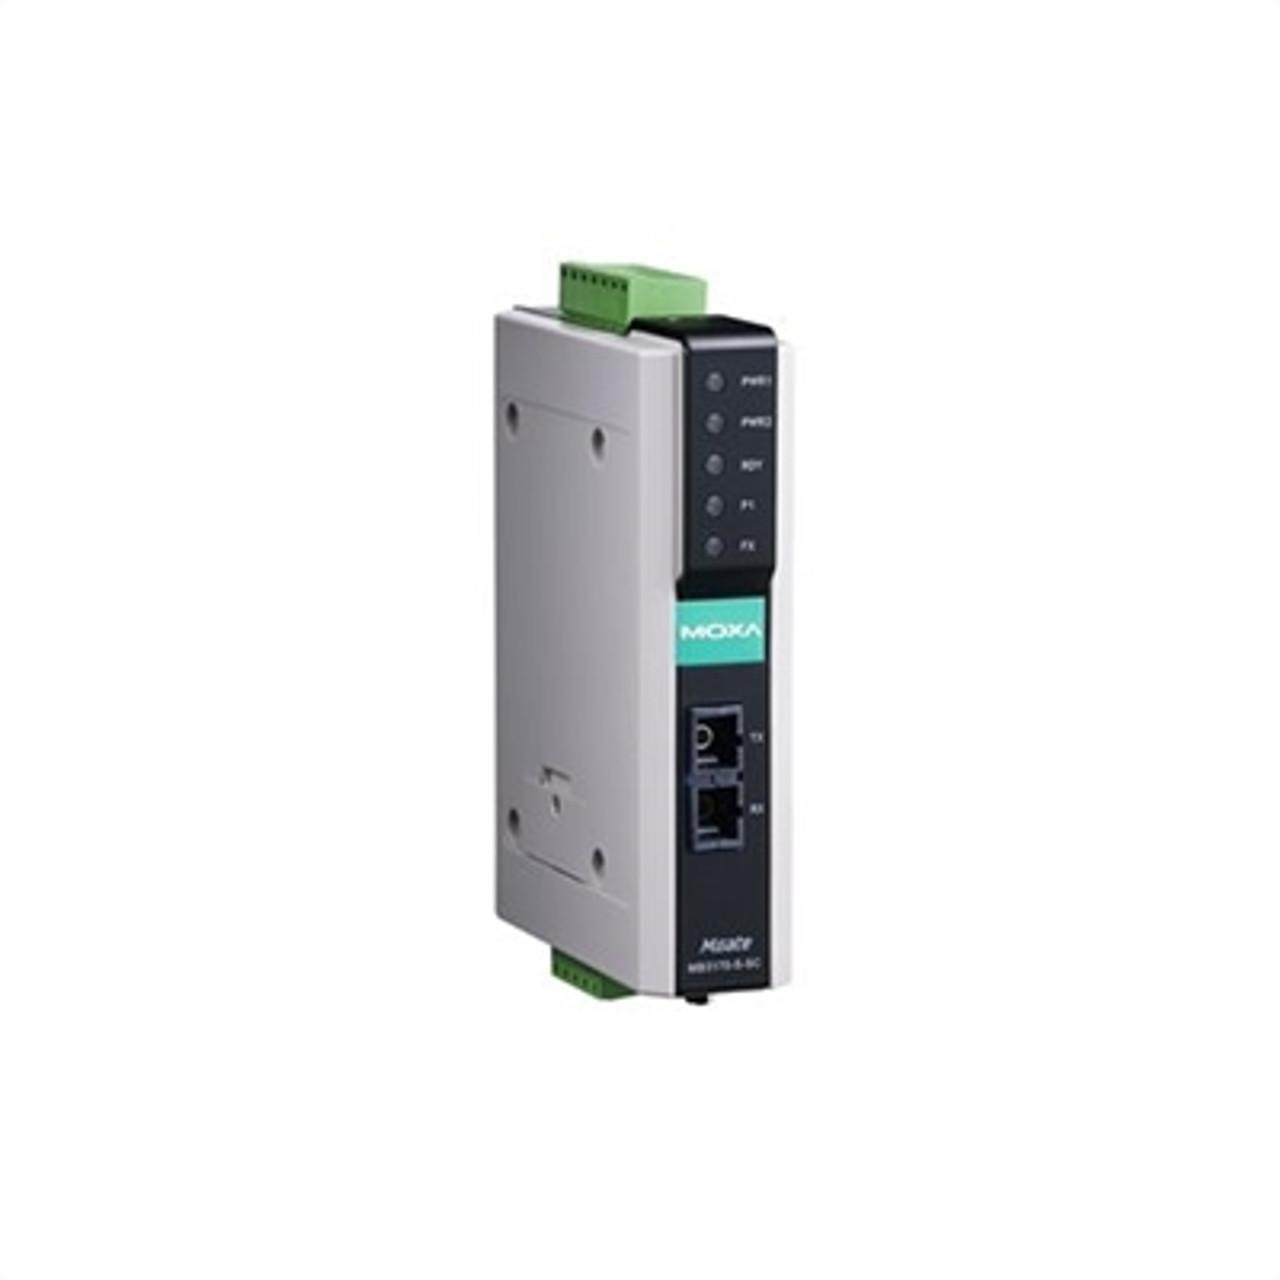 Moxa MGate MB3170I-S-SC 1-Port Advanced Modbus Gateway